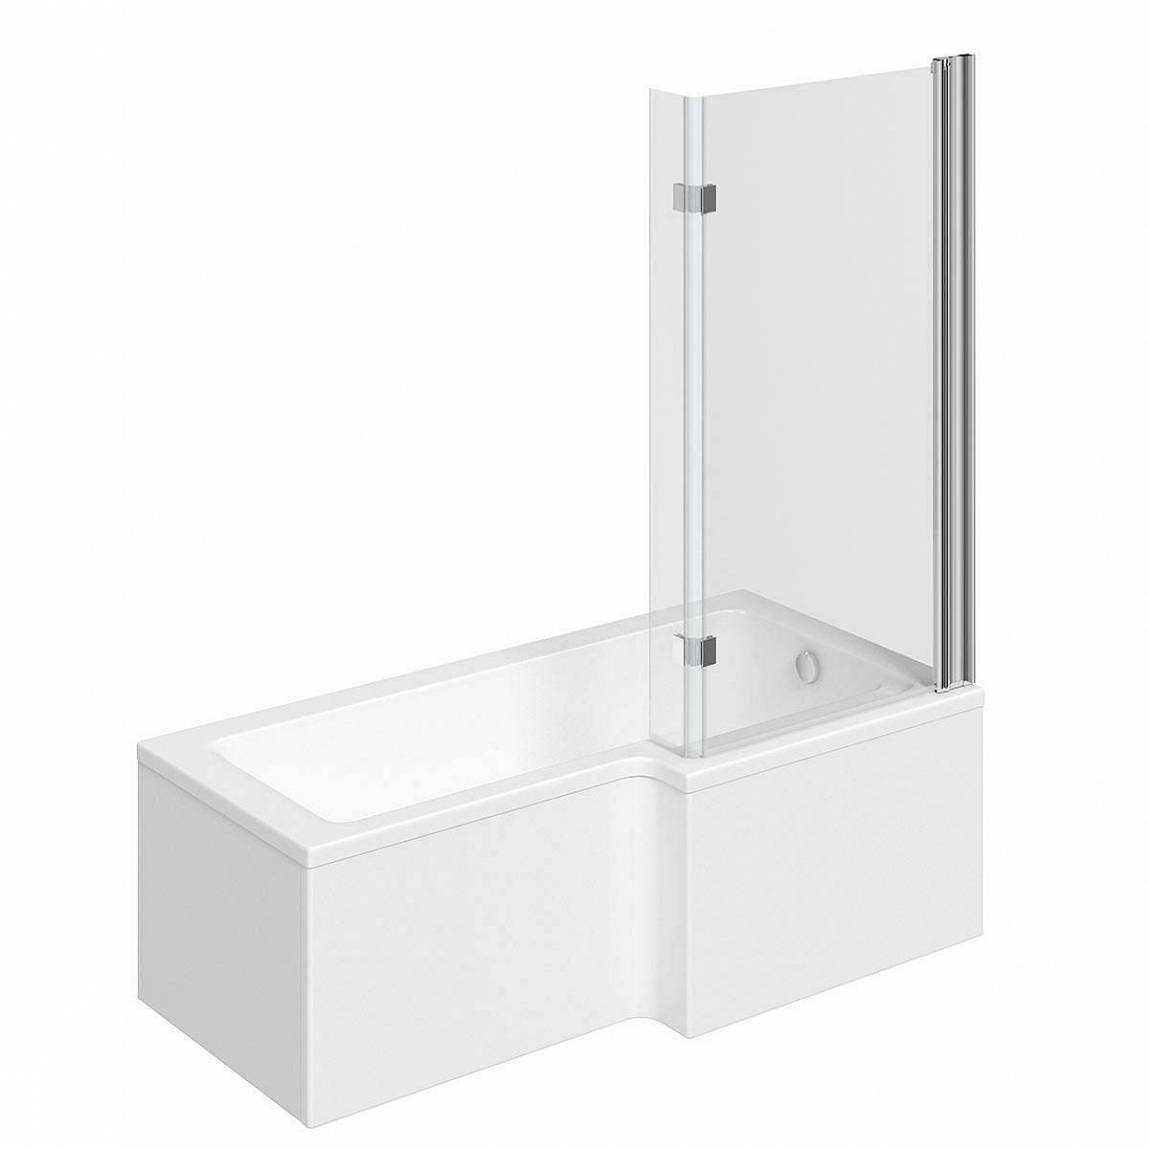 Image of Boston Shower Bath 1700 x 850 RH inc. 8mm Hinged Screen